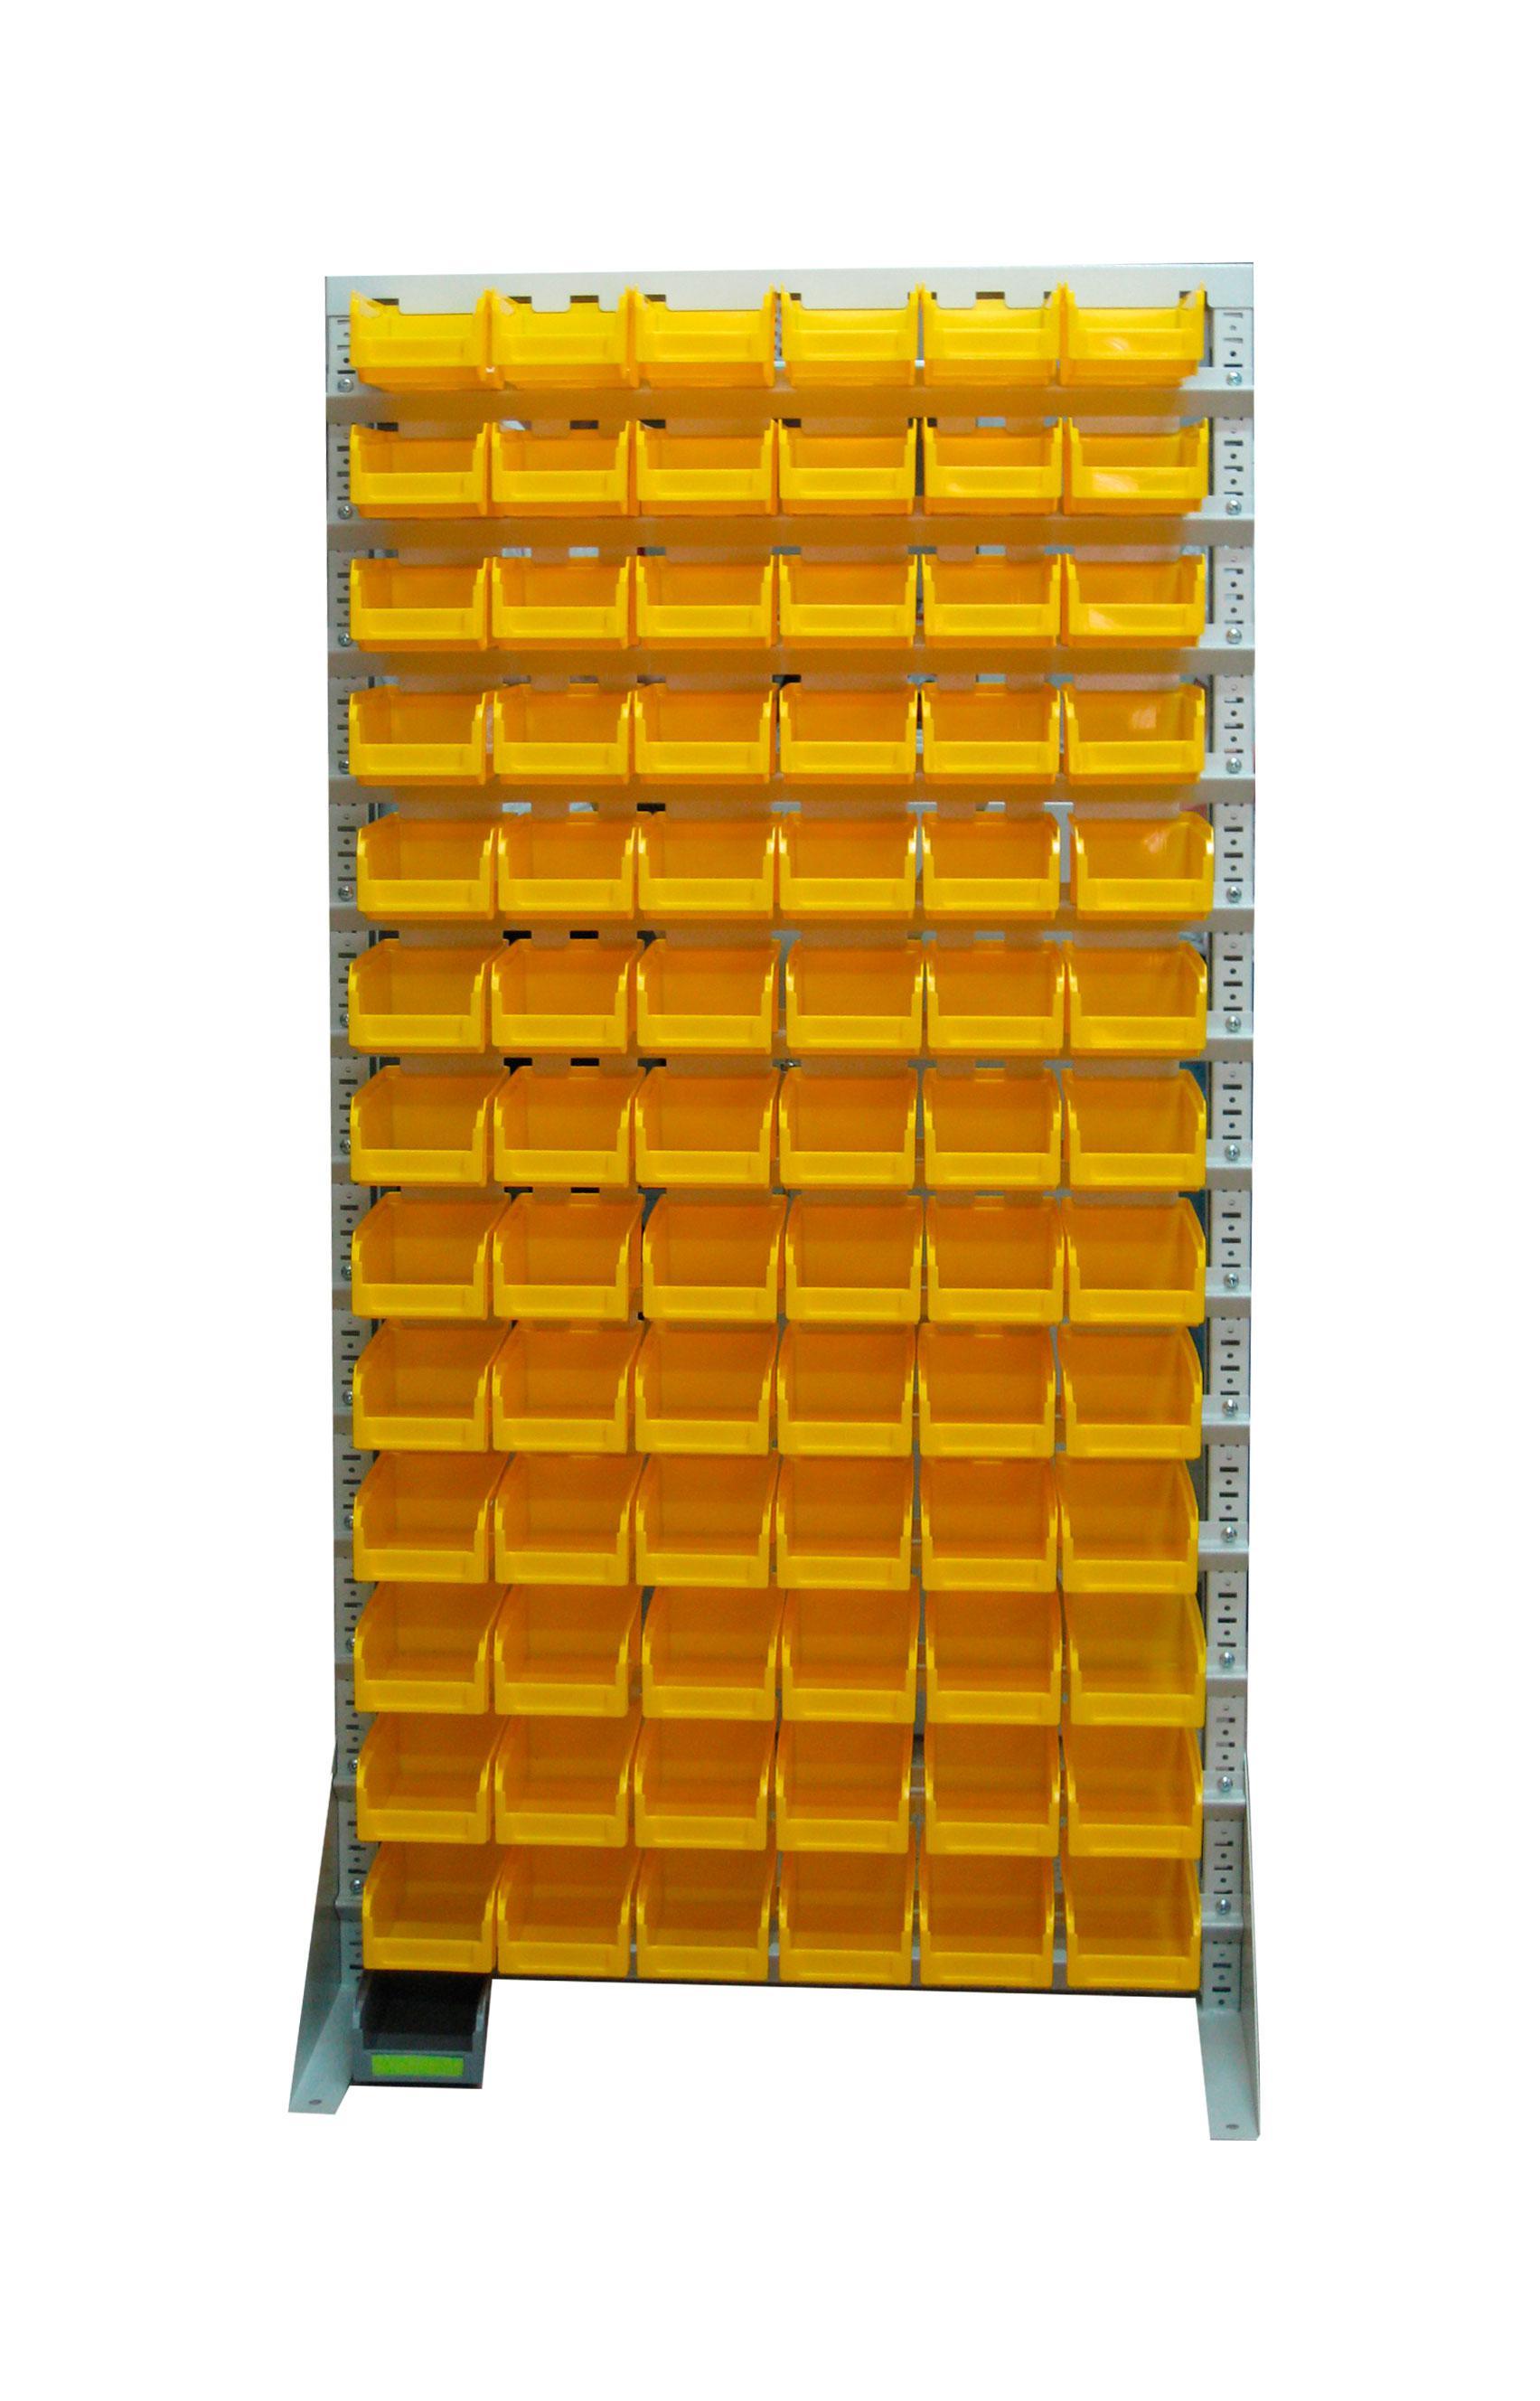 СТЕЛЛА - Стойка СТЕЛЛА A1-13-00-00 желтый (A1-13-00-00 желтый)